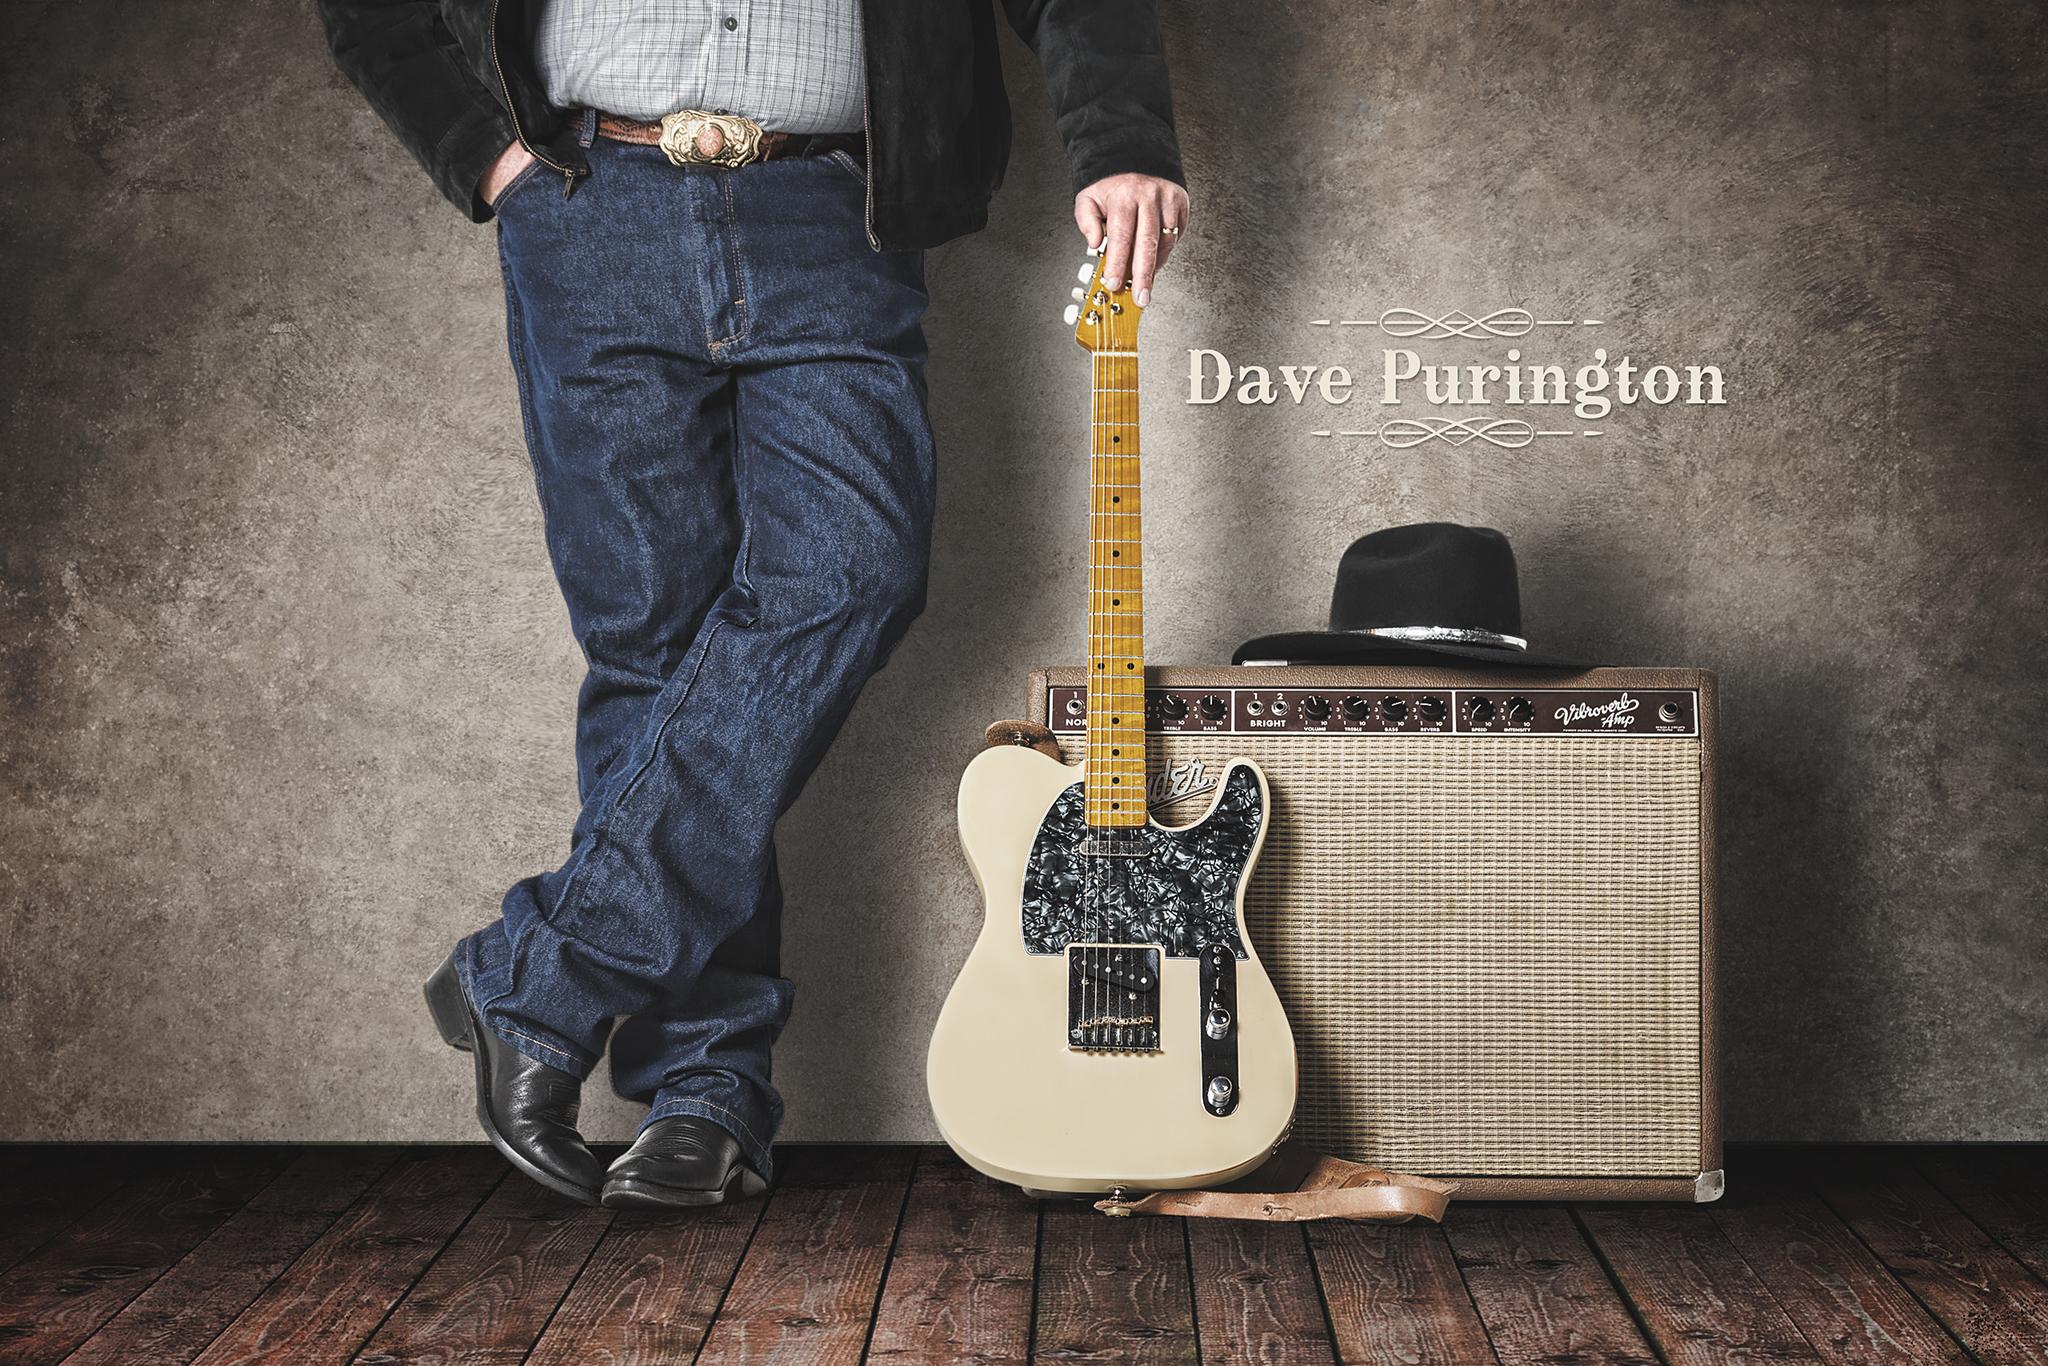 Dave-Purington-FB.jpg